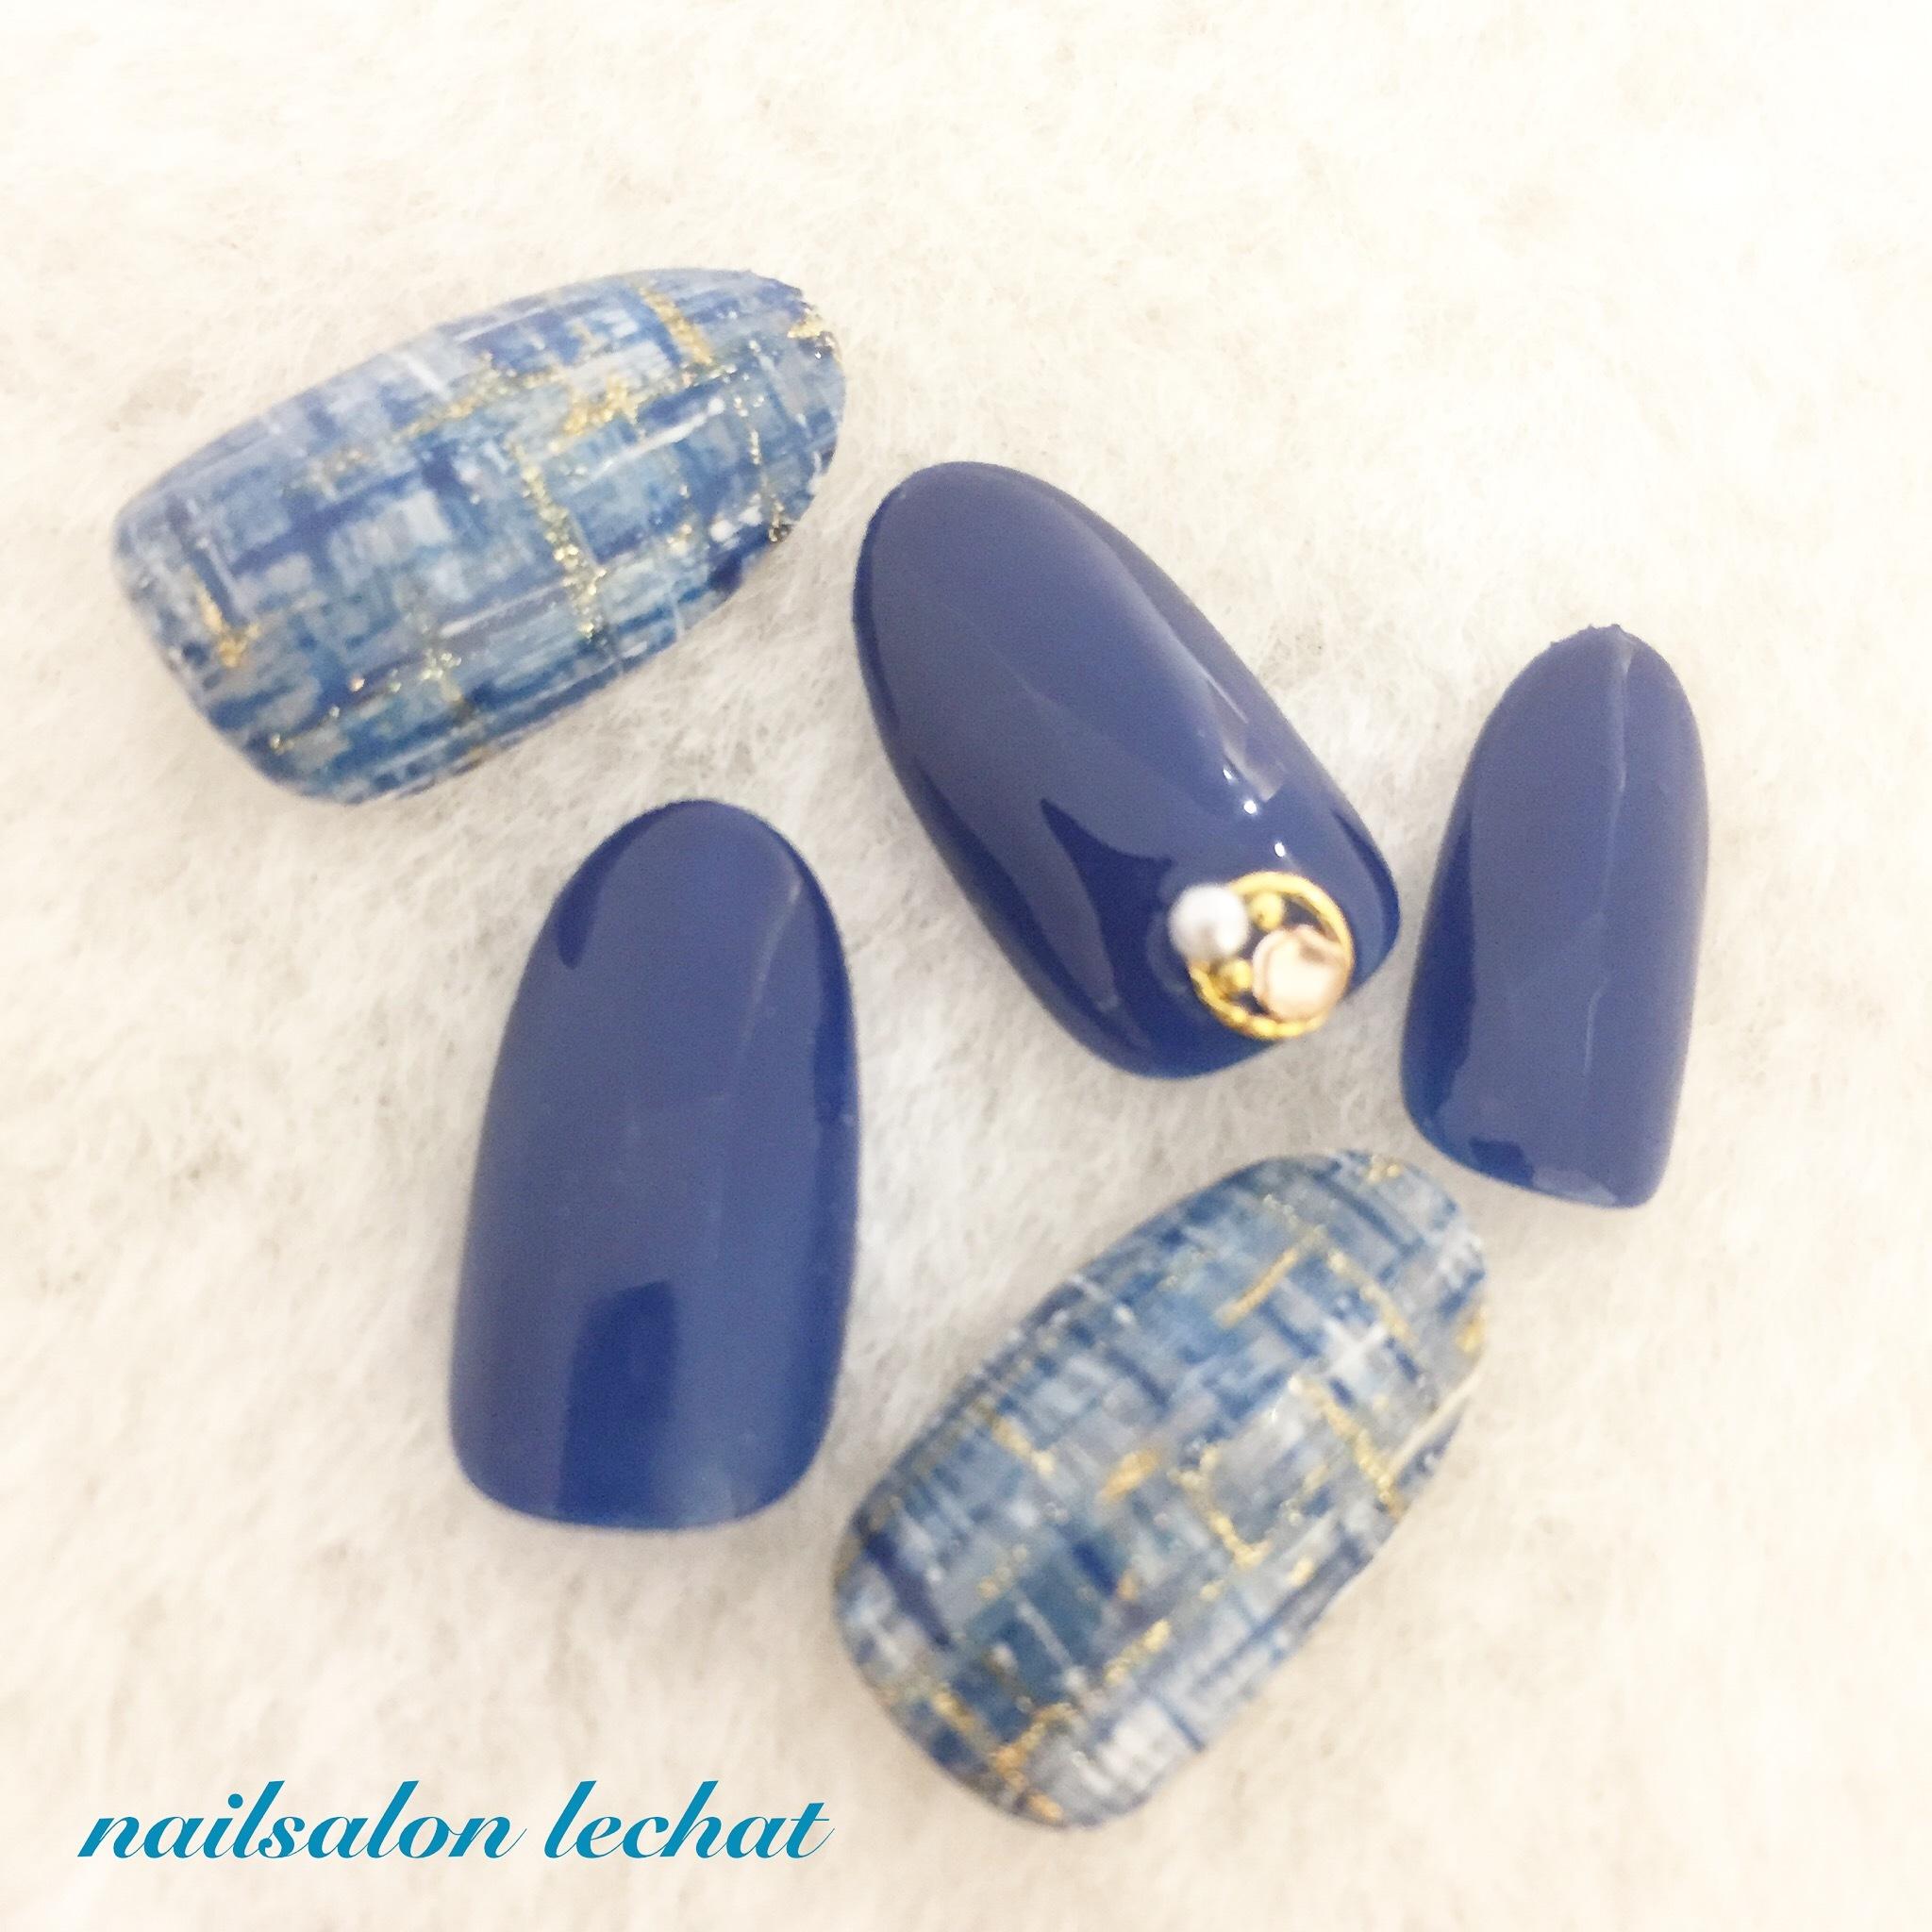 Nail Salon Le Chat (nail salon Rusha)